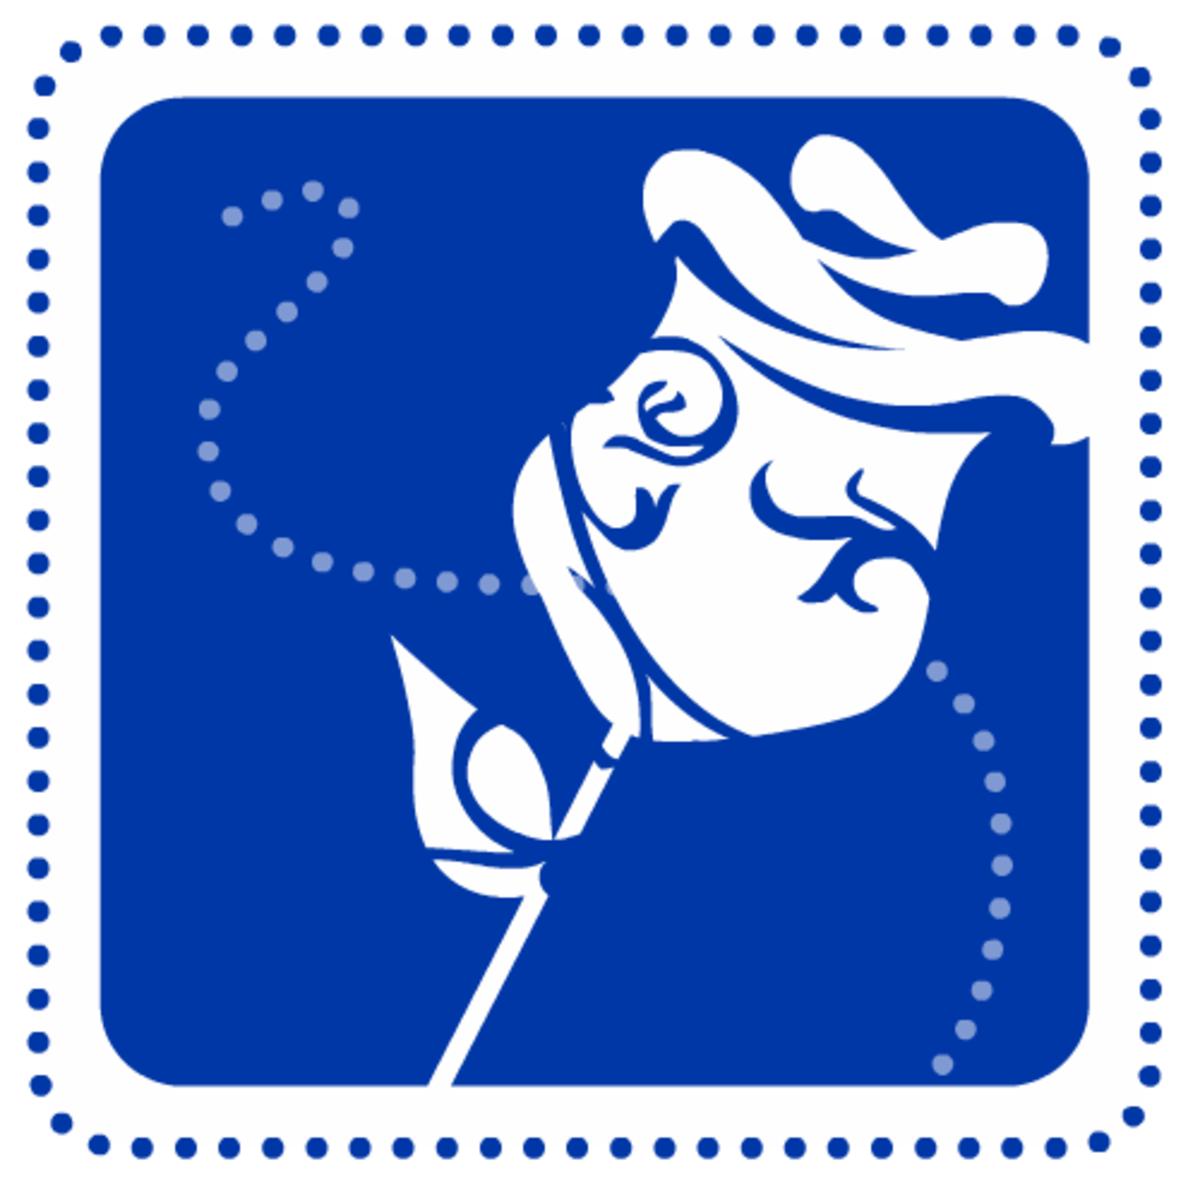 Valentine clip art: Blue rose